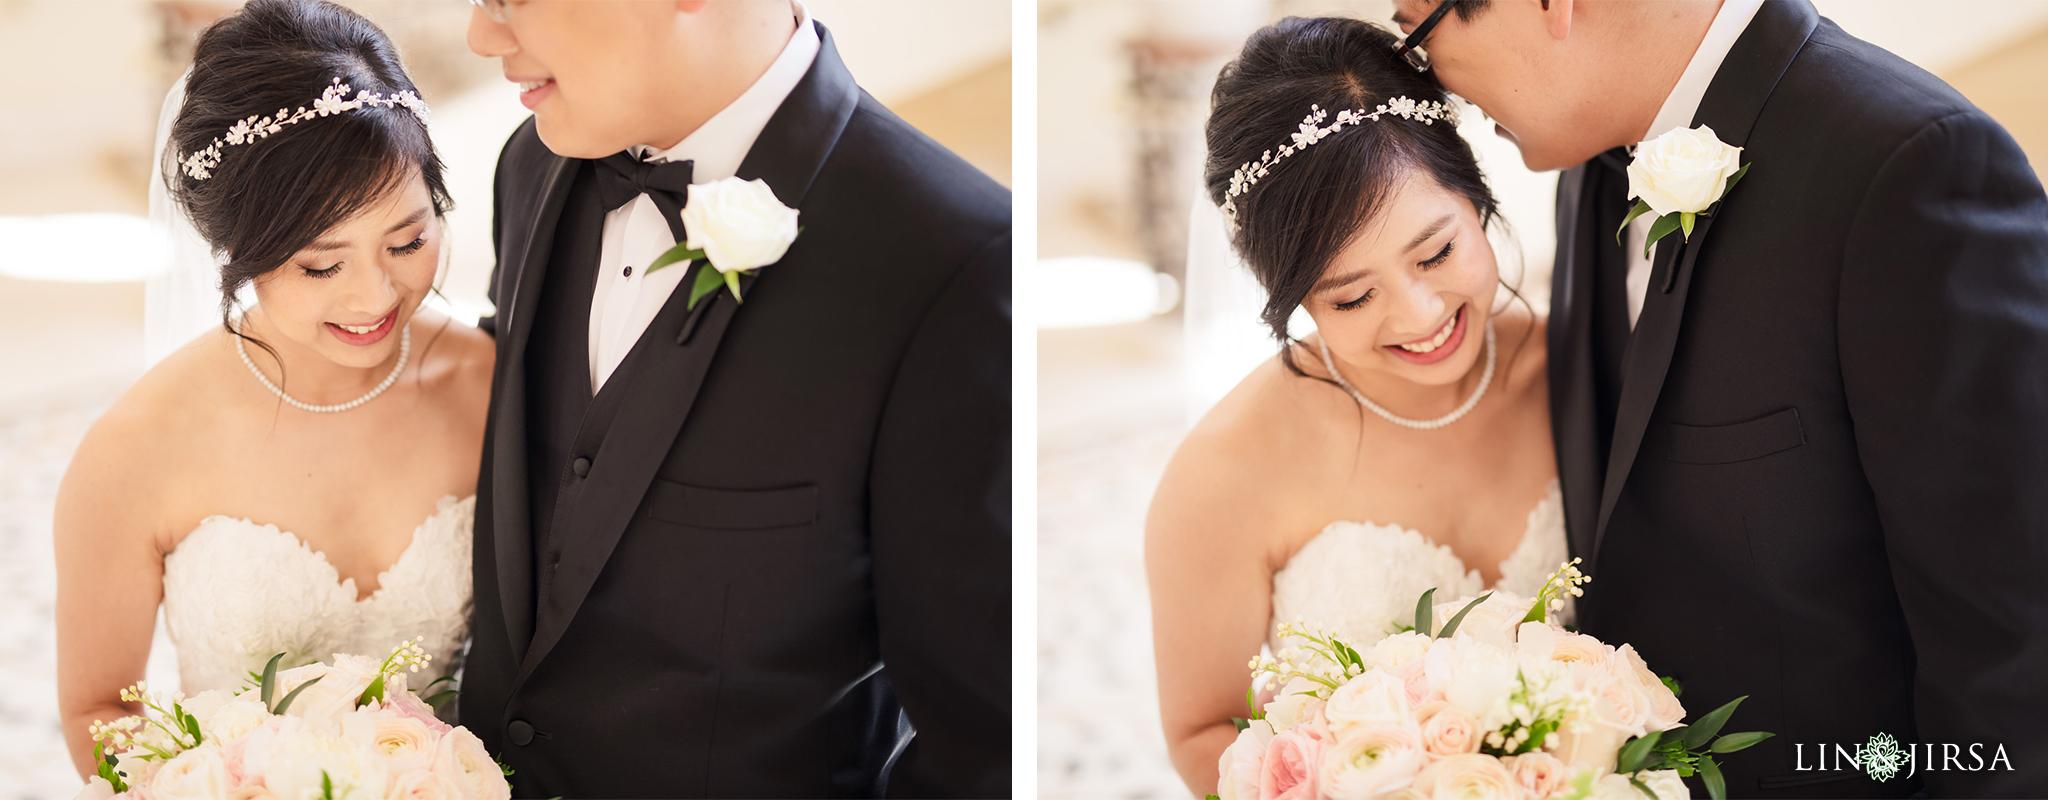 15 Monarch Beach Resort Dana Point Wedding Photography